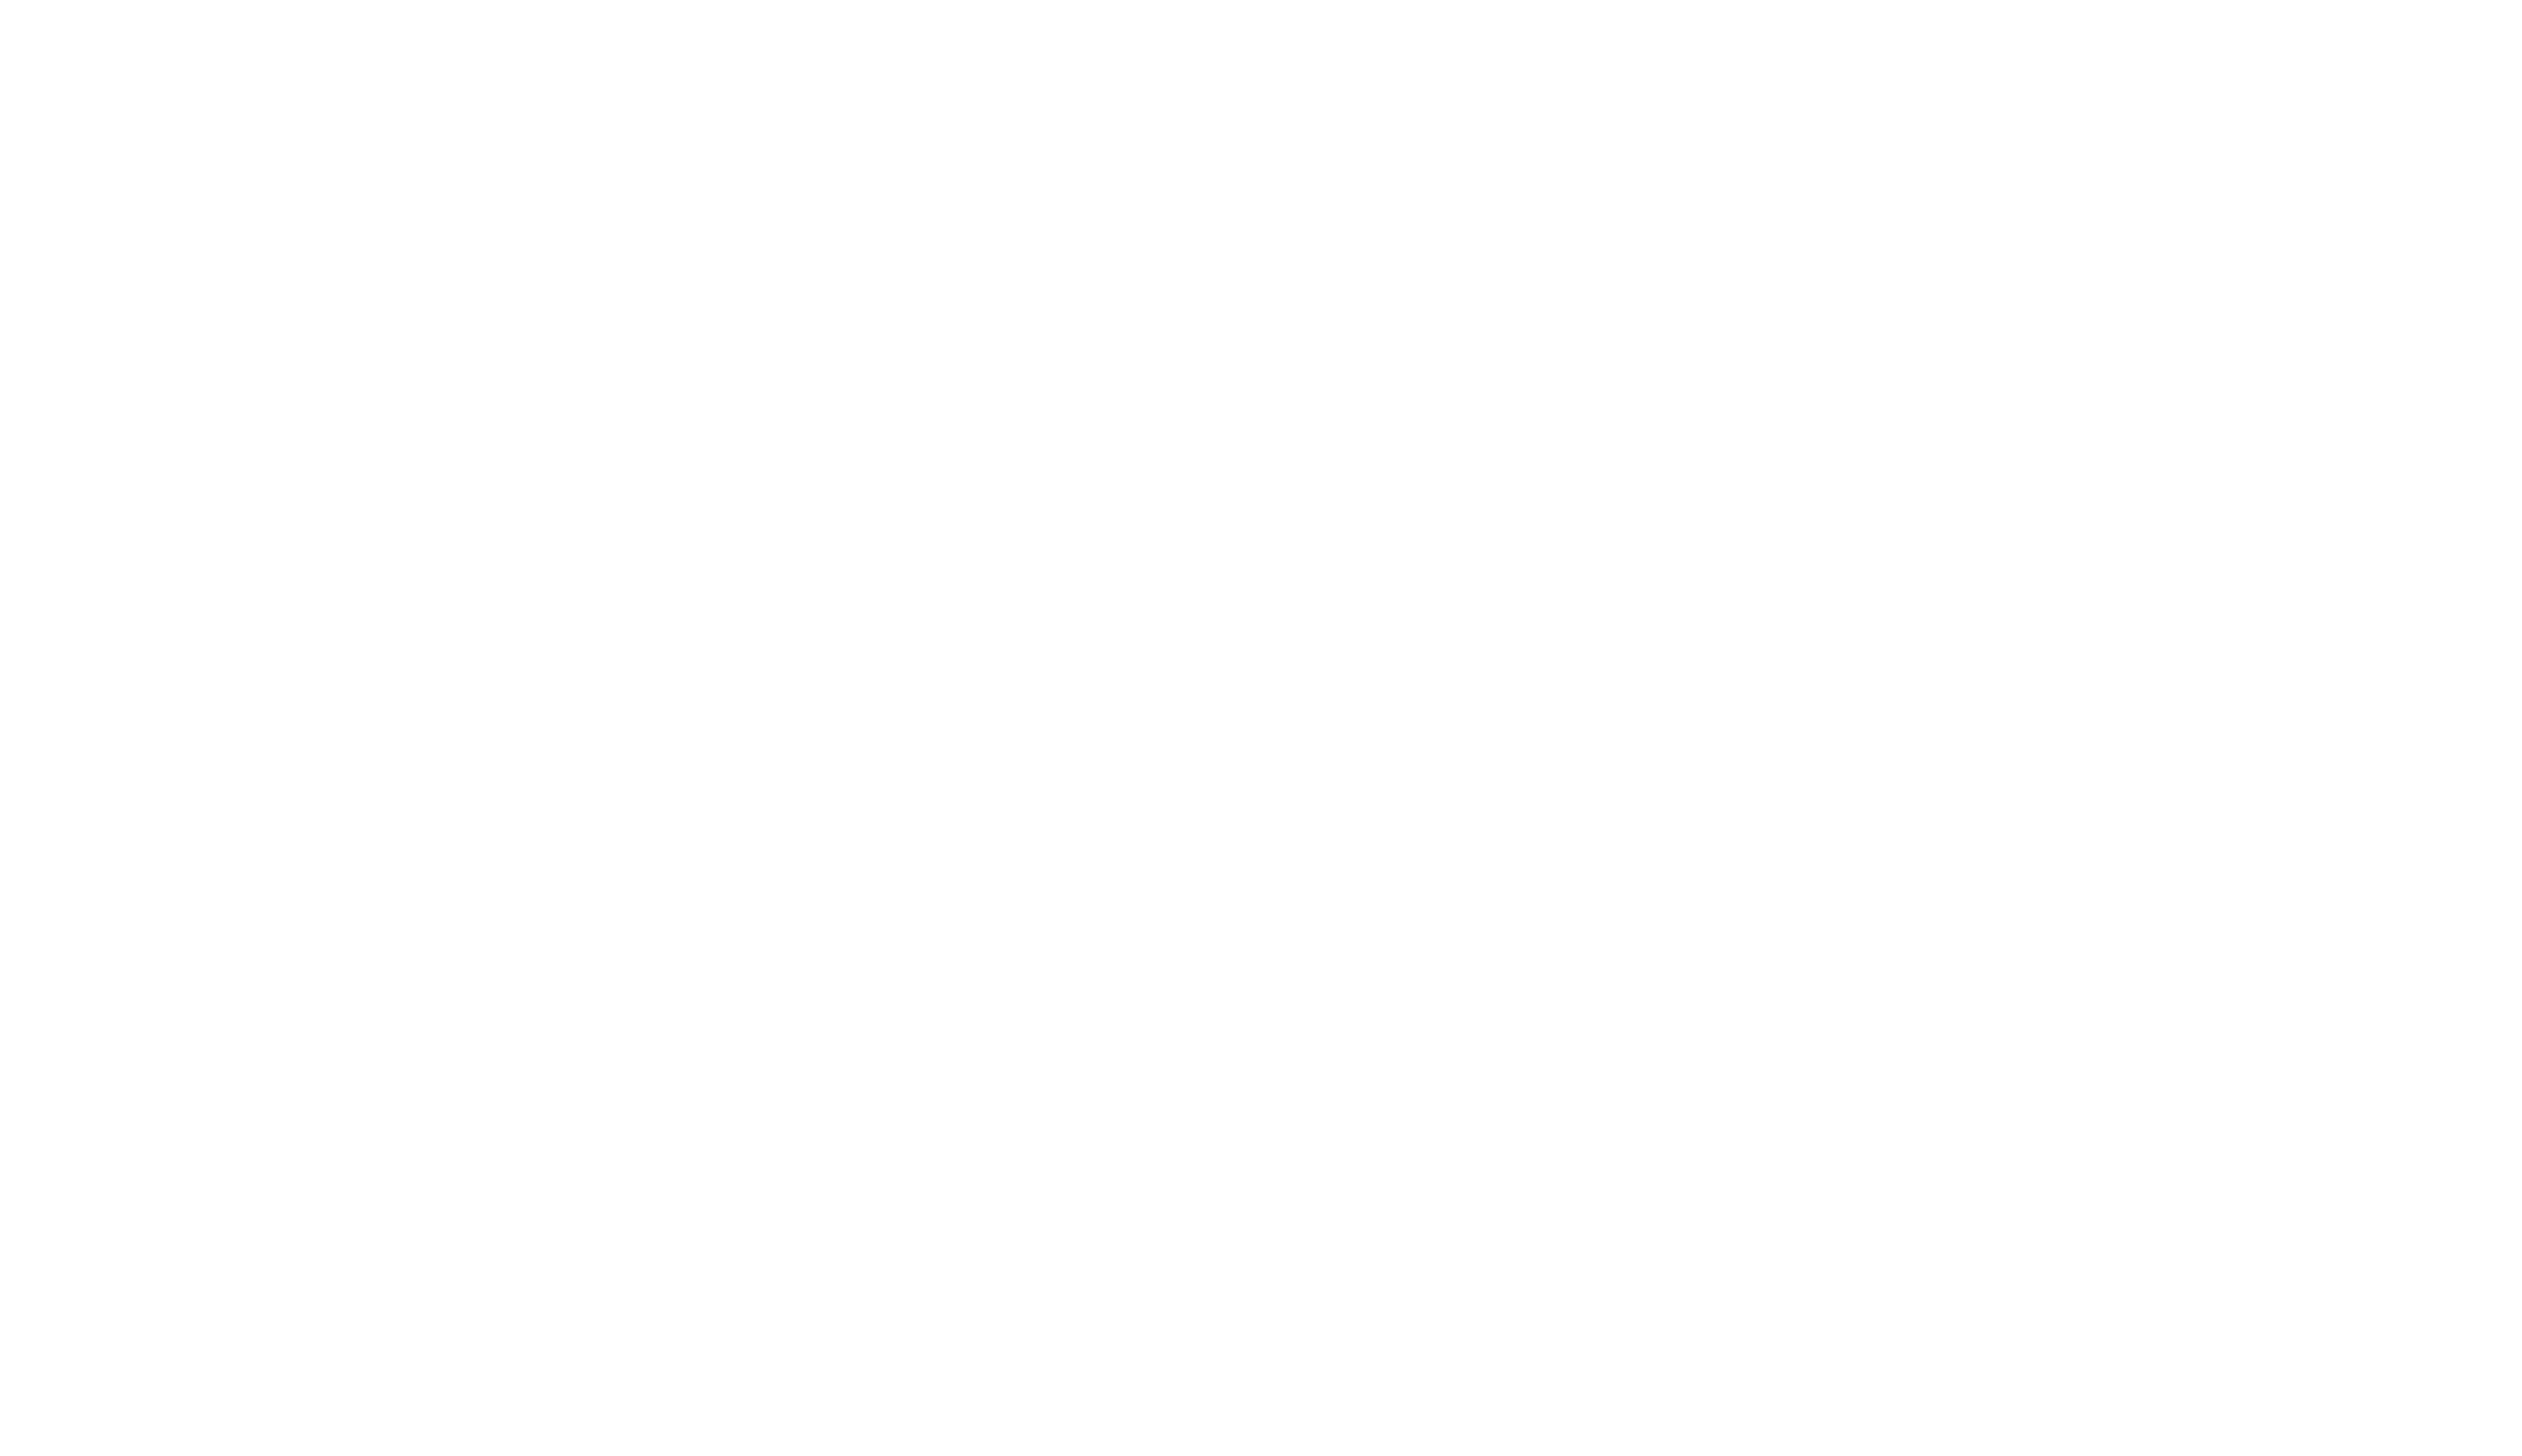 triangle bottom